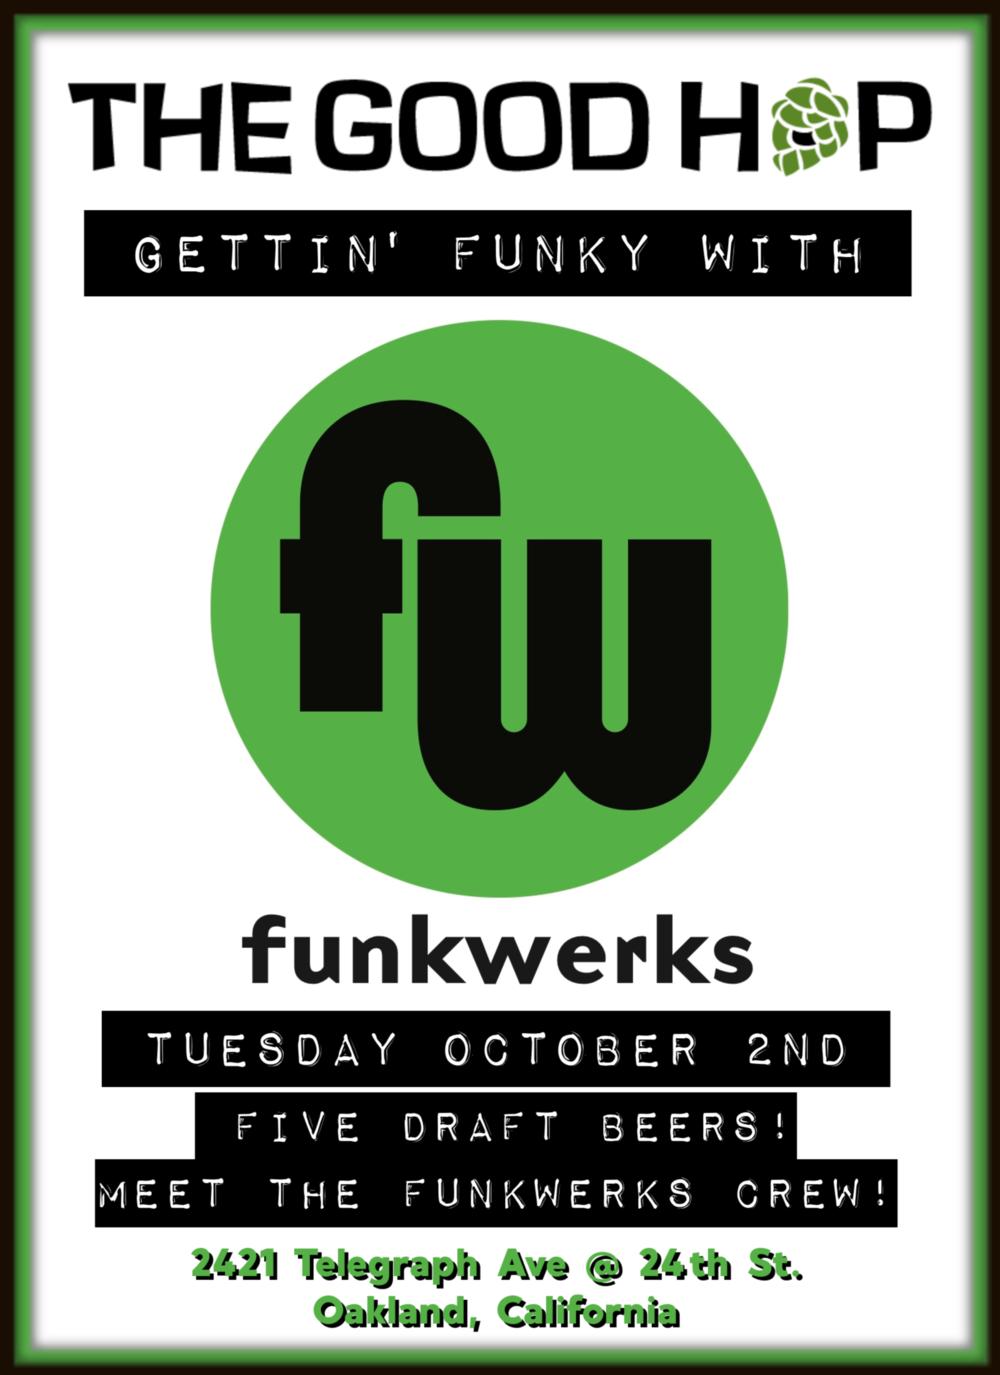 Funkwerks Flyer 5x7.png